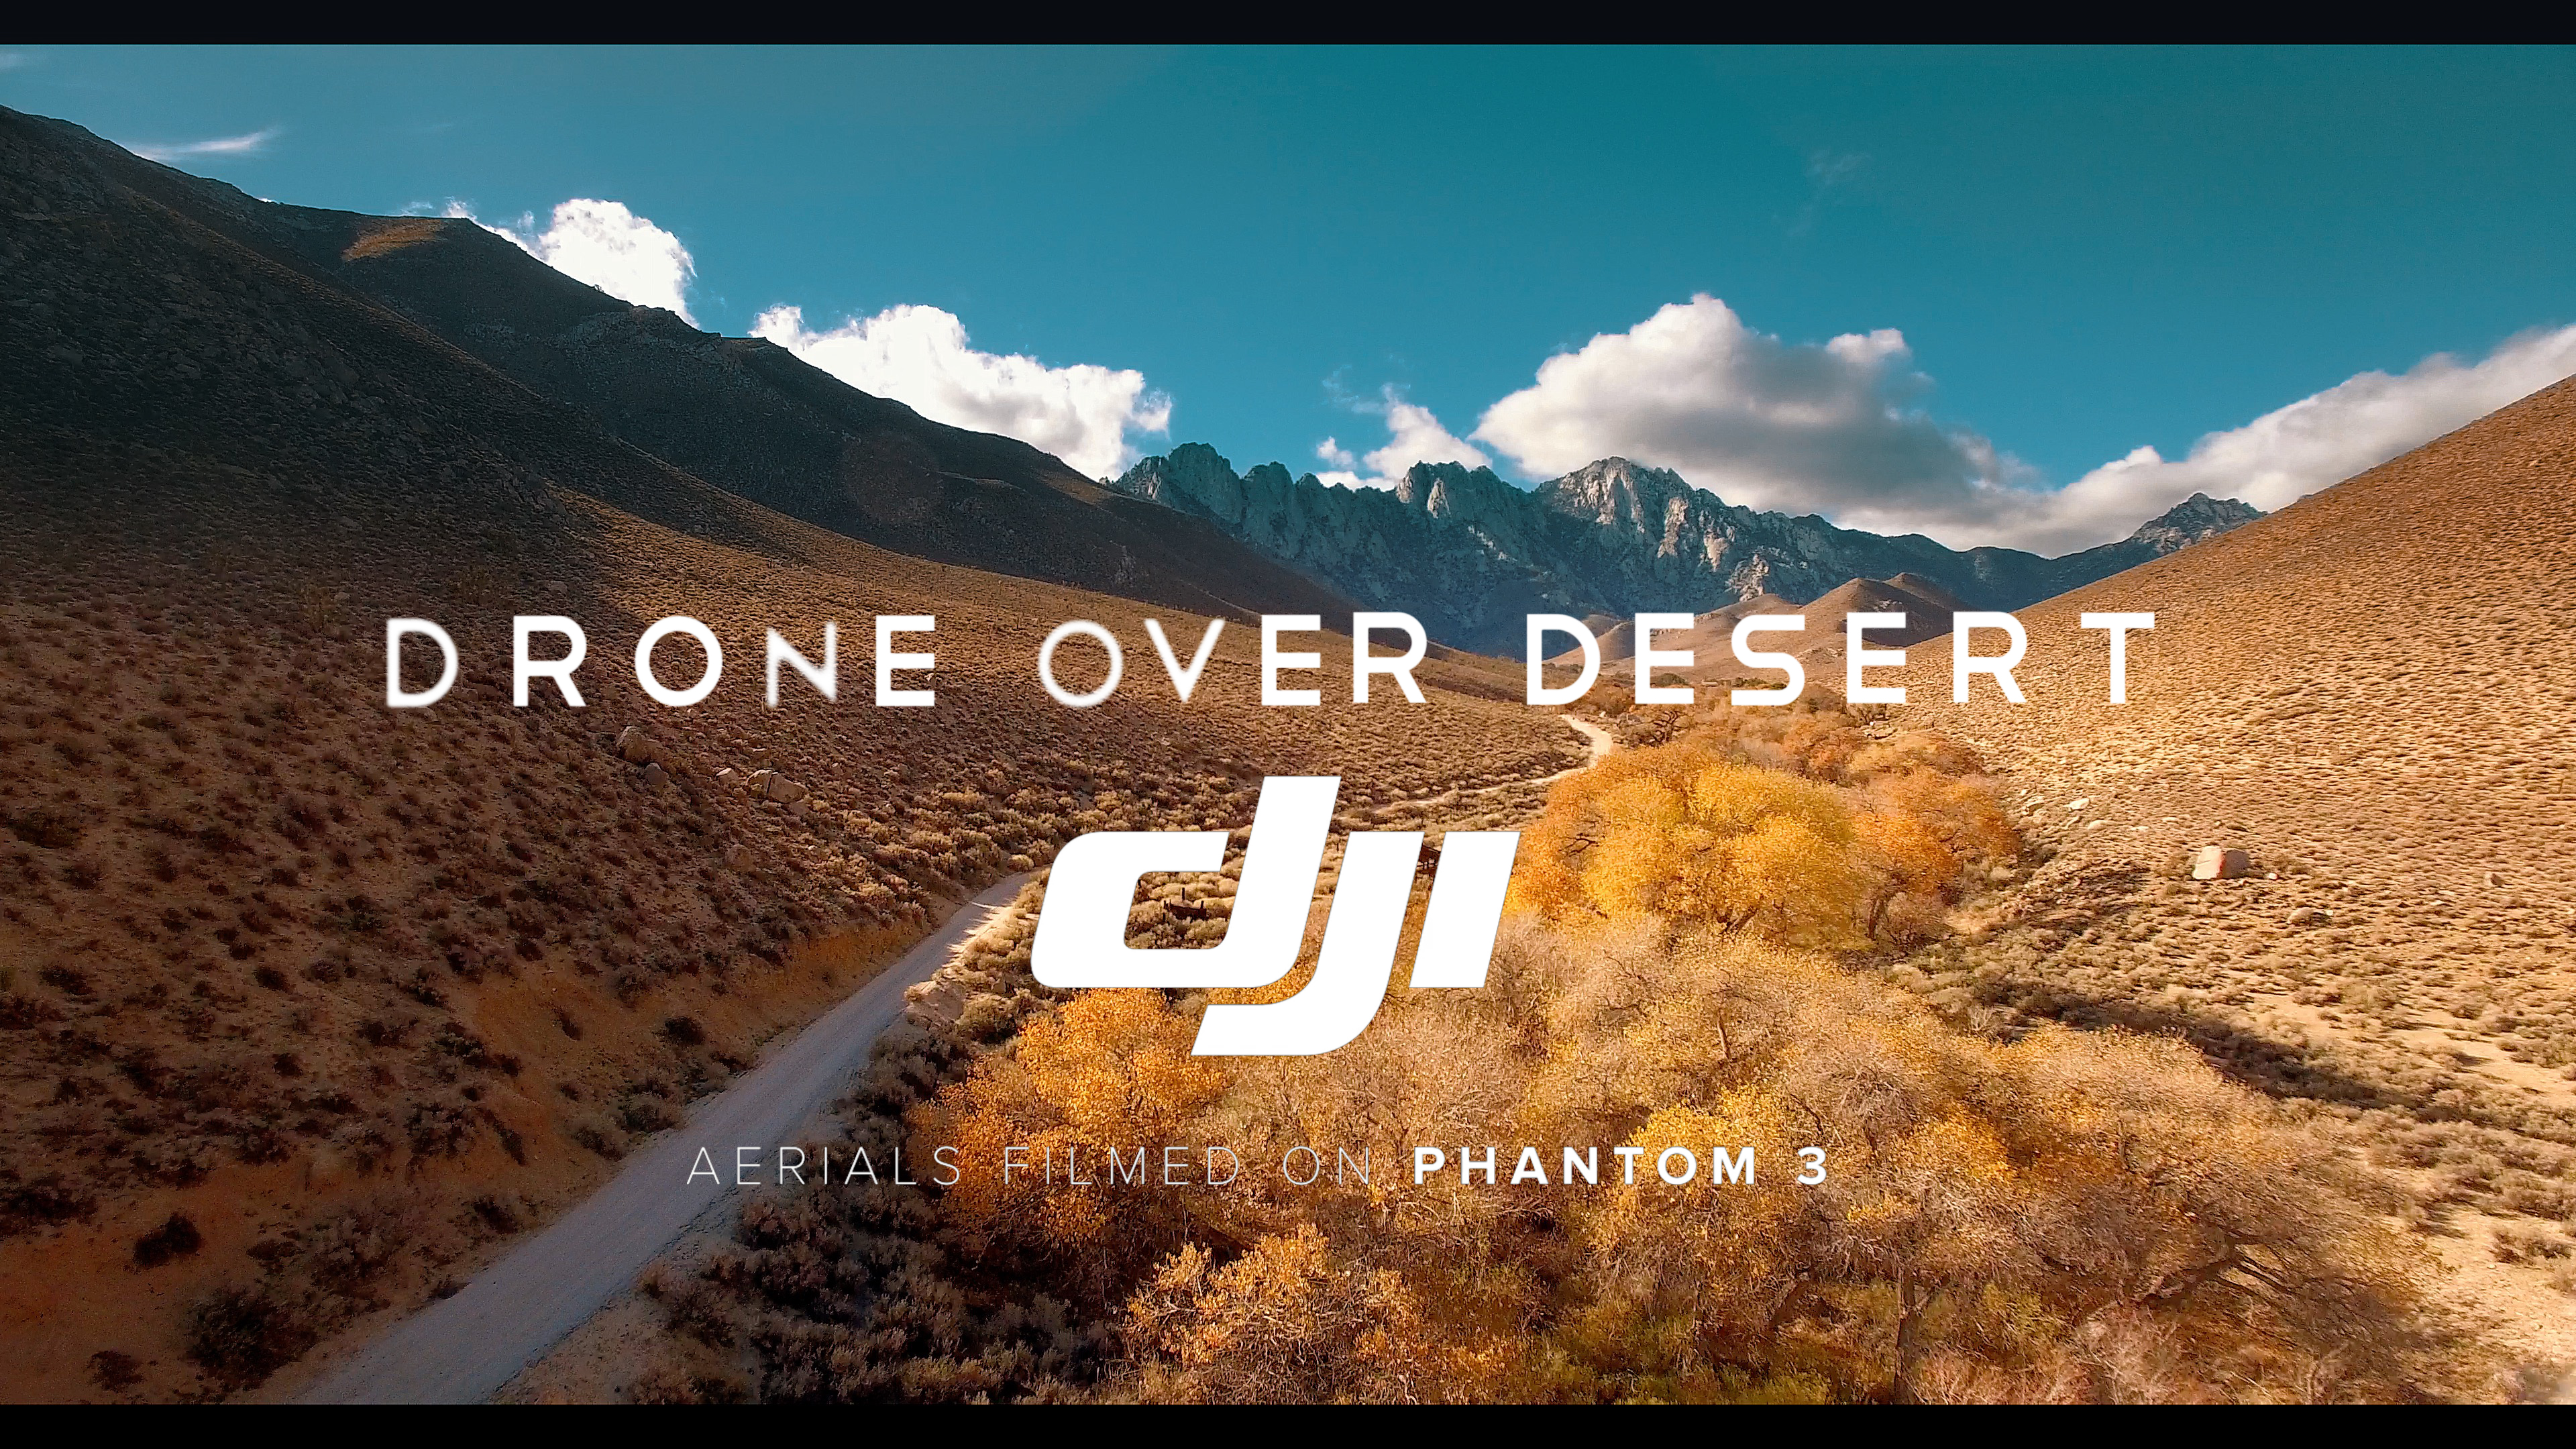 Drone Over Desert title 3_00000